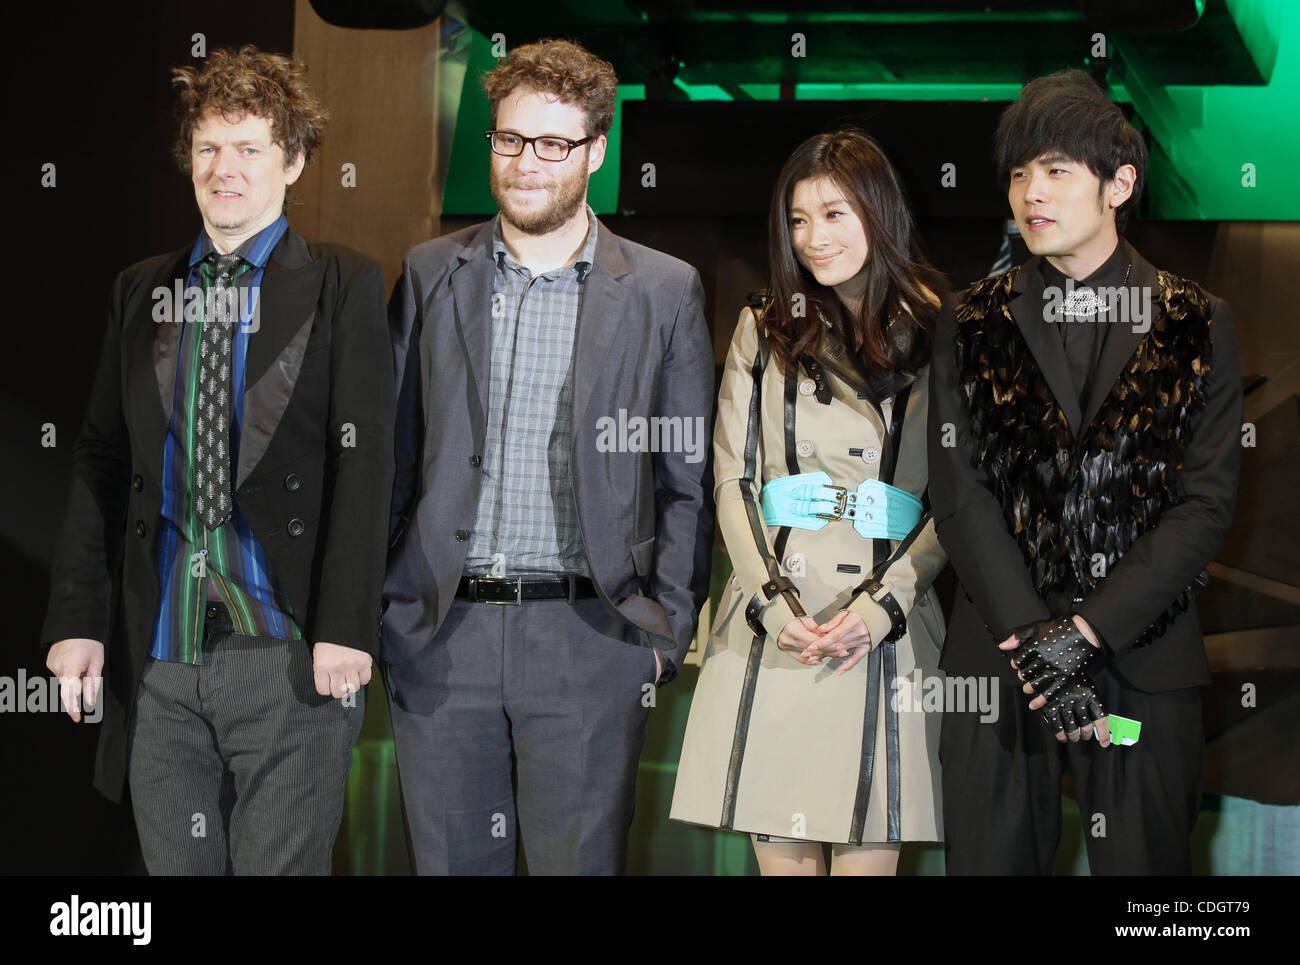 Jan. 20, 2011 - Tokyo, Japan - (L to R) Director MICHEL GONDRY, Canadian actor SETH ROGAN, Japanese actress RYOKO - Stock Image